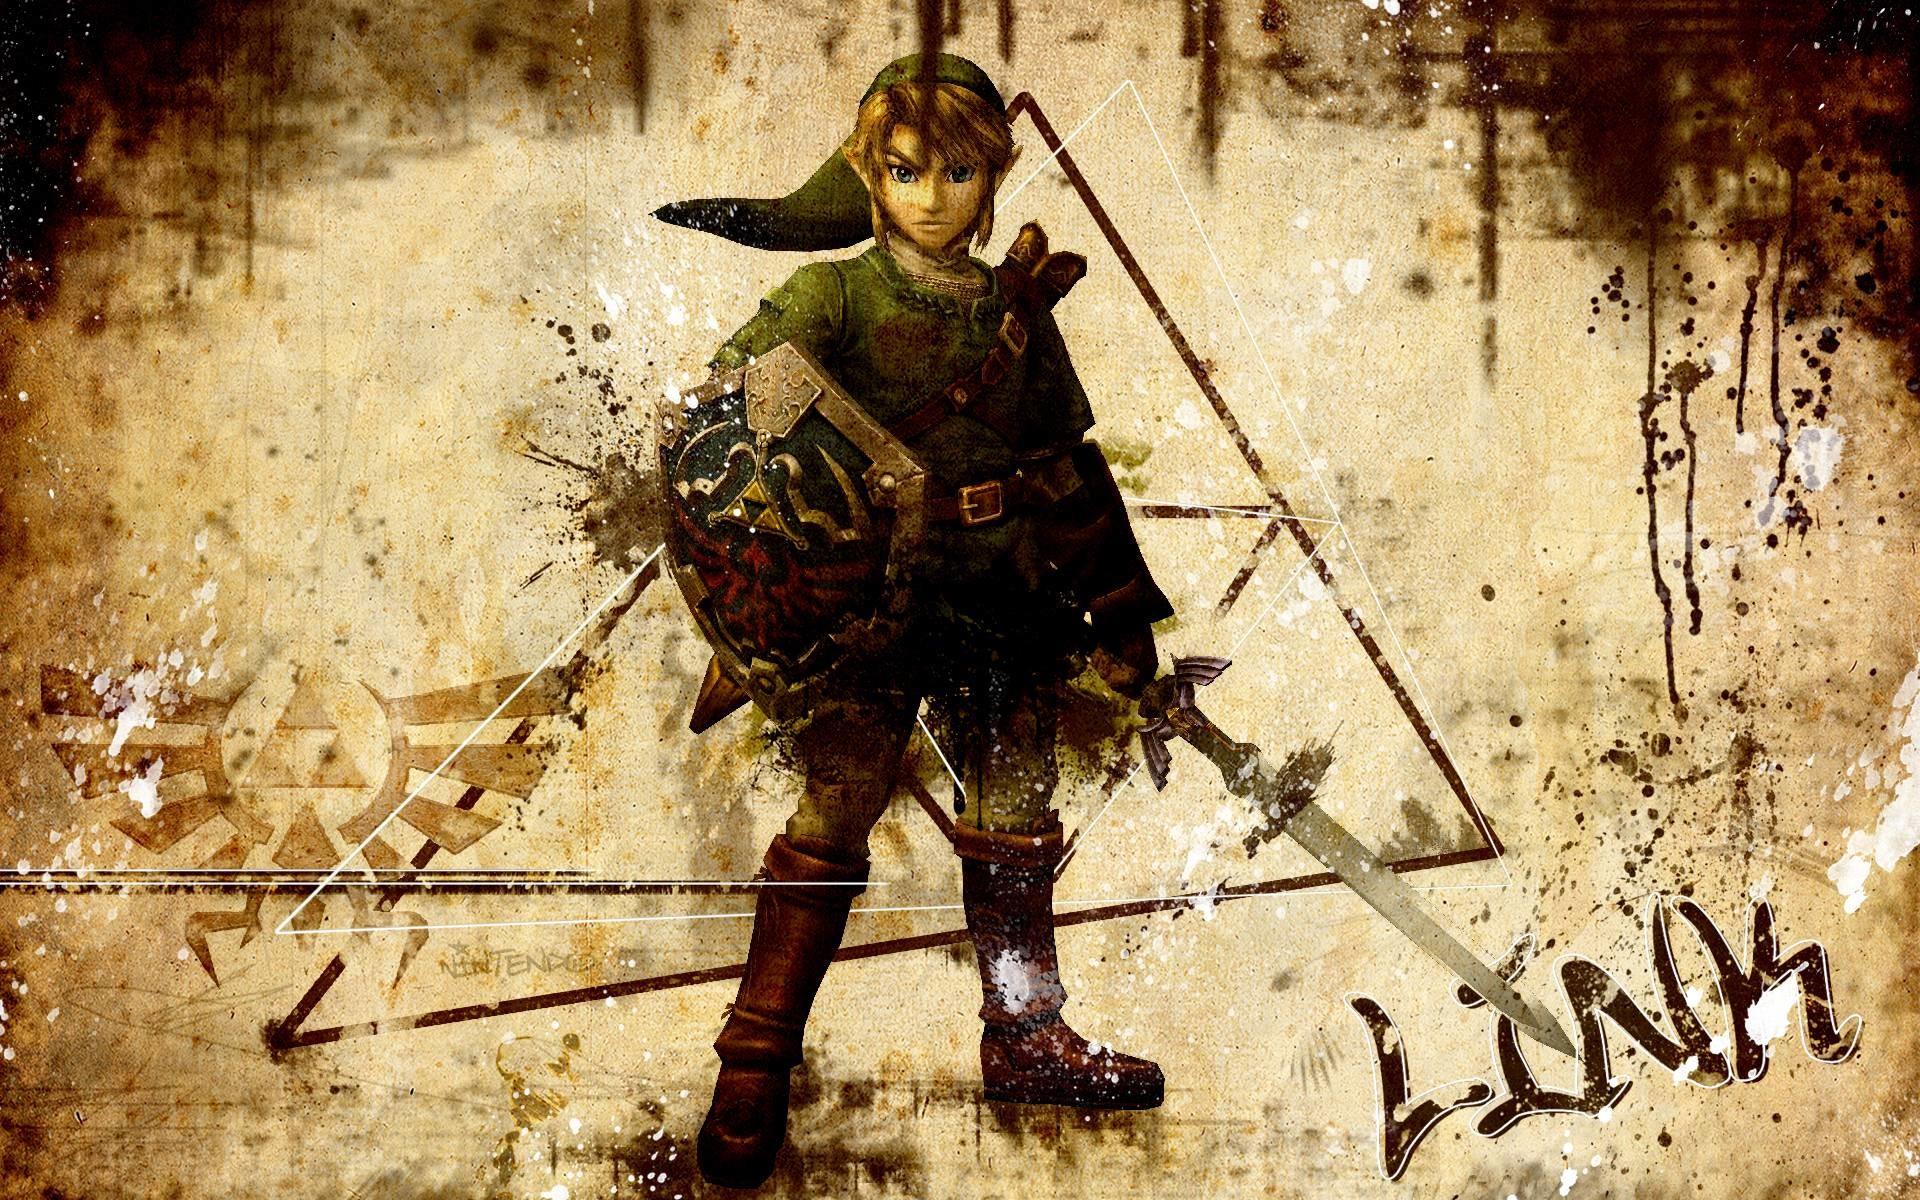 Link – The Legend of Zelda Wallpaper (2833139) – Fanpop